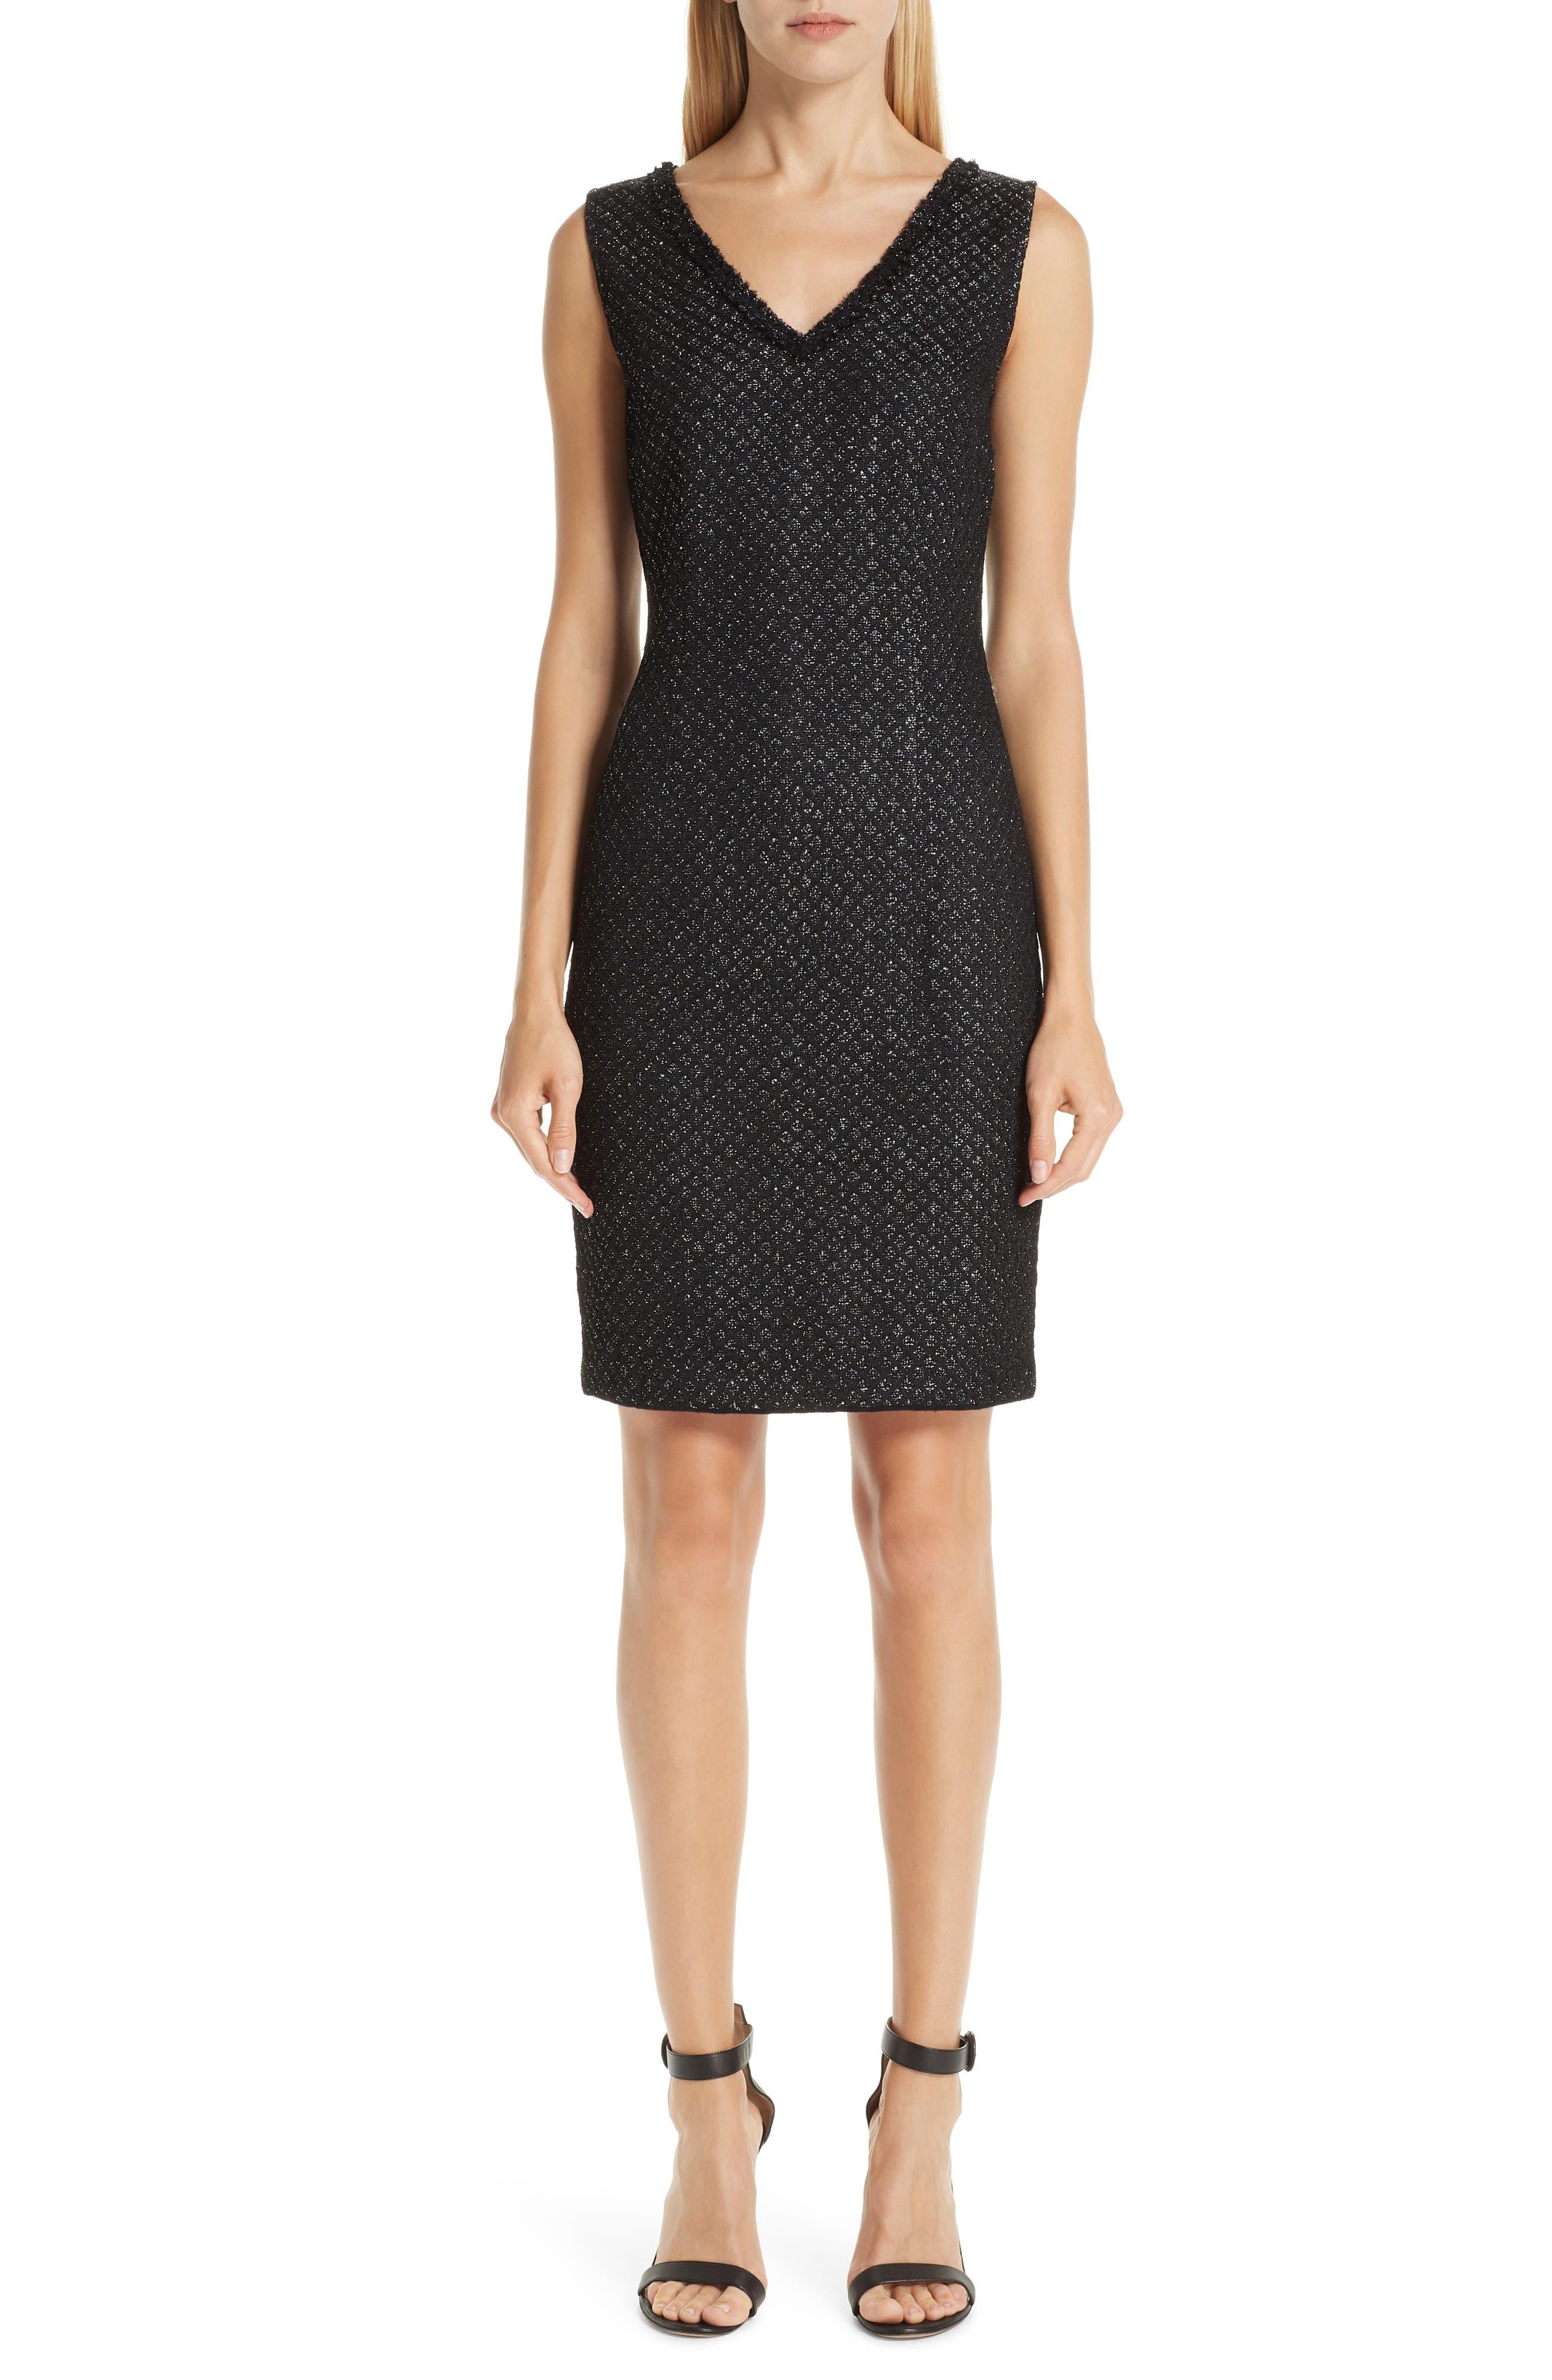 ST. JOHN COLLECTION, Shimmer Inlay Brocade Knit Dress, Main thumbnail 1, color, CAVIAR/ SILVER